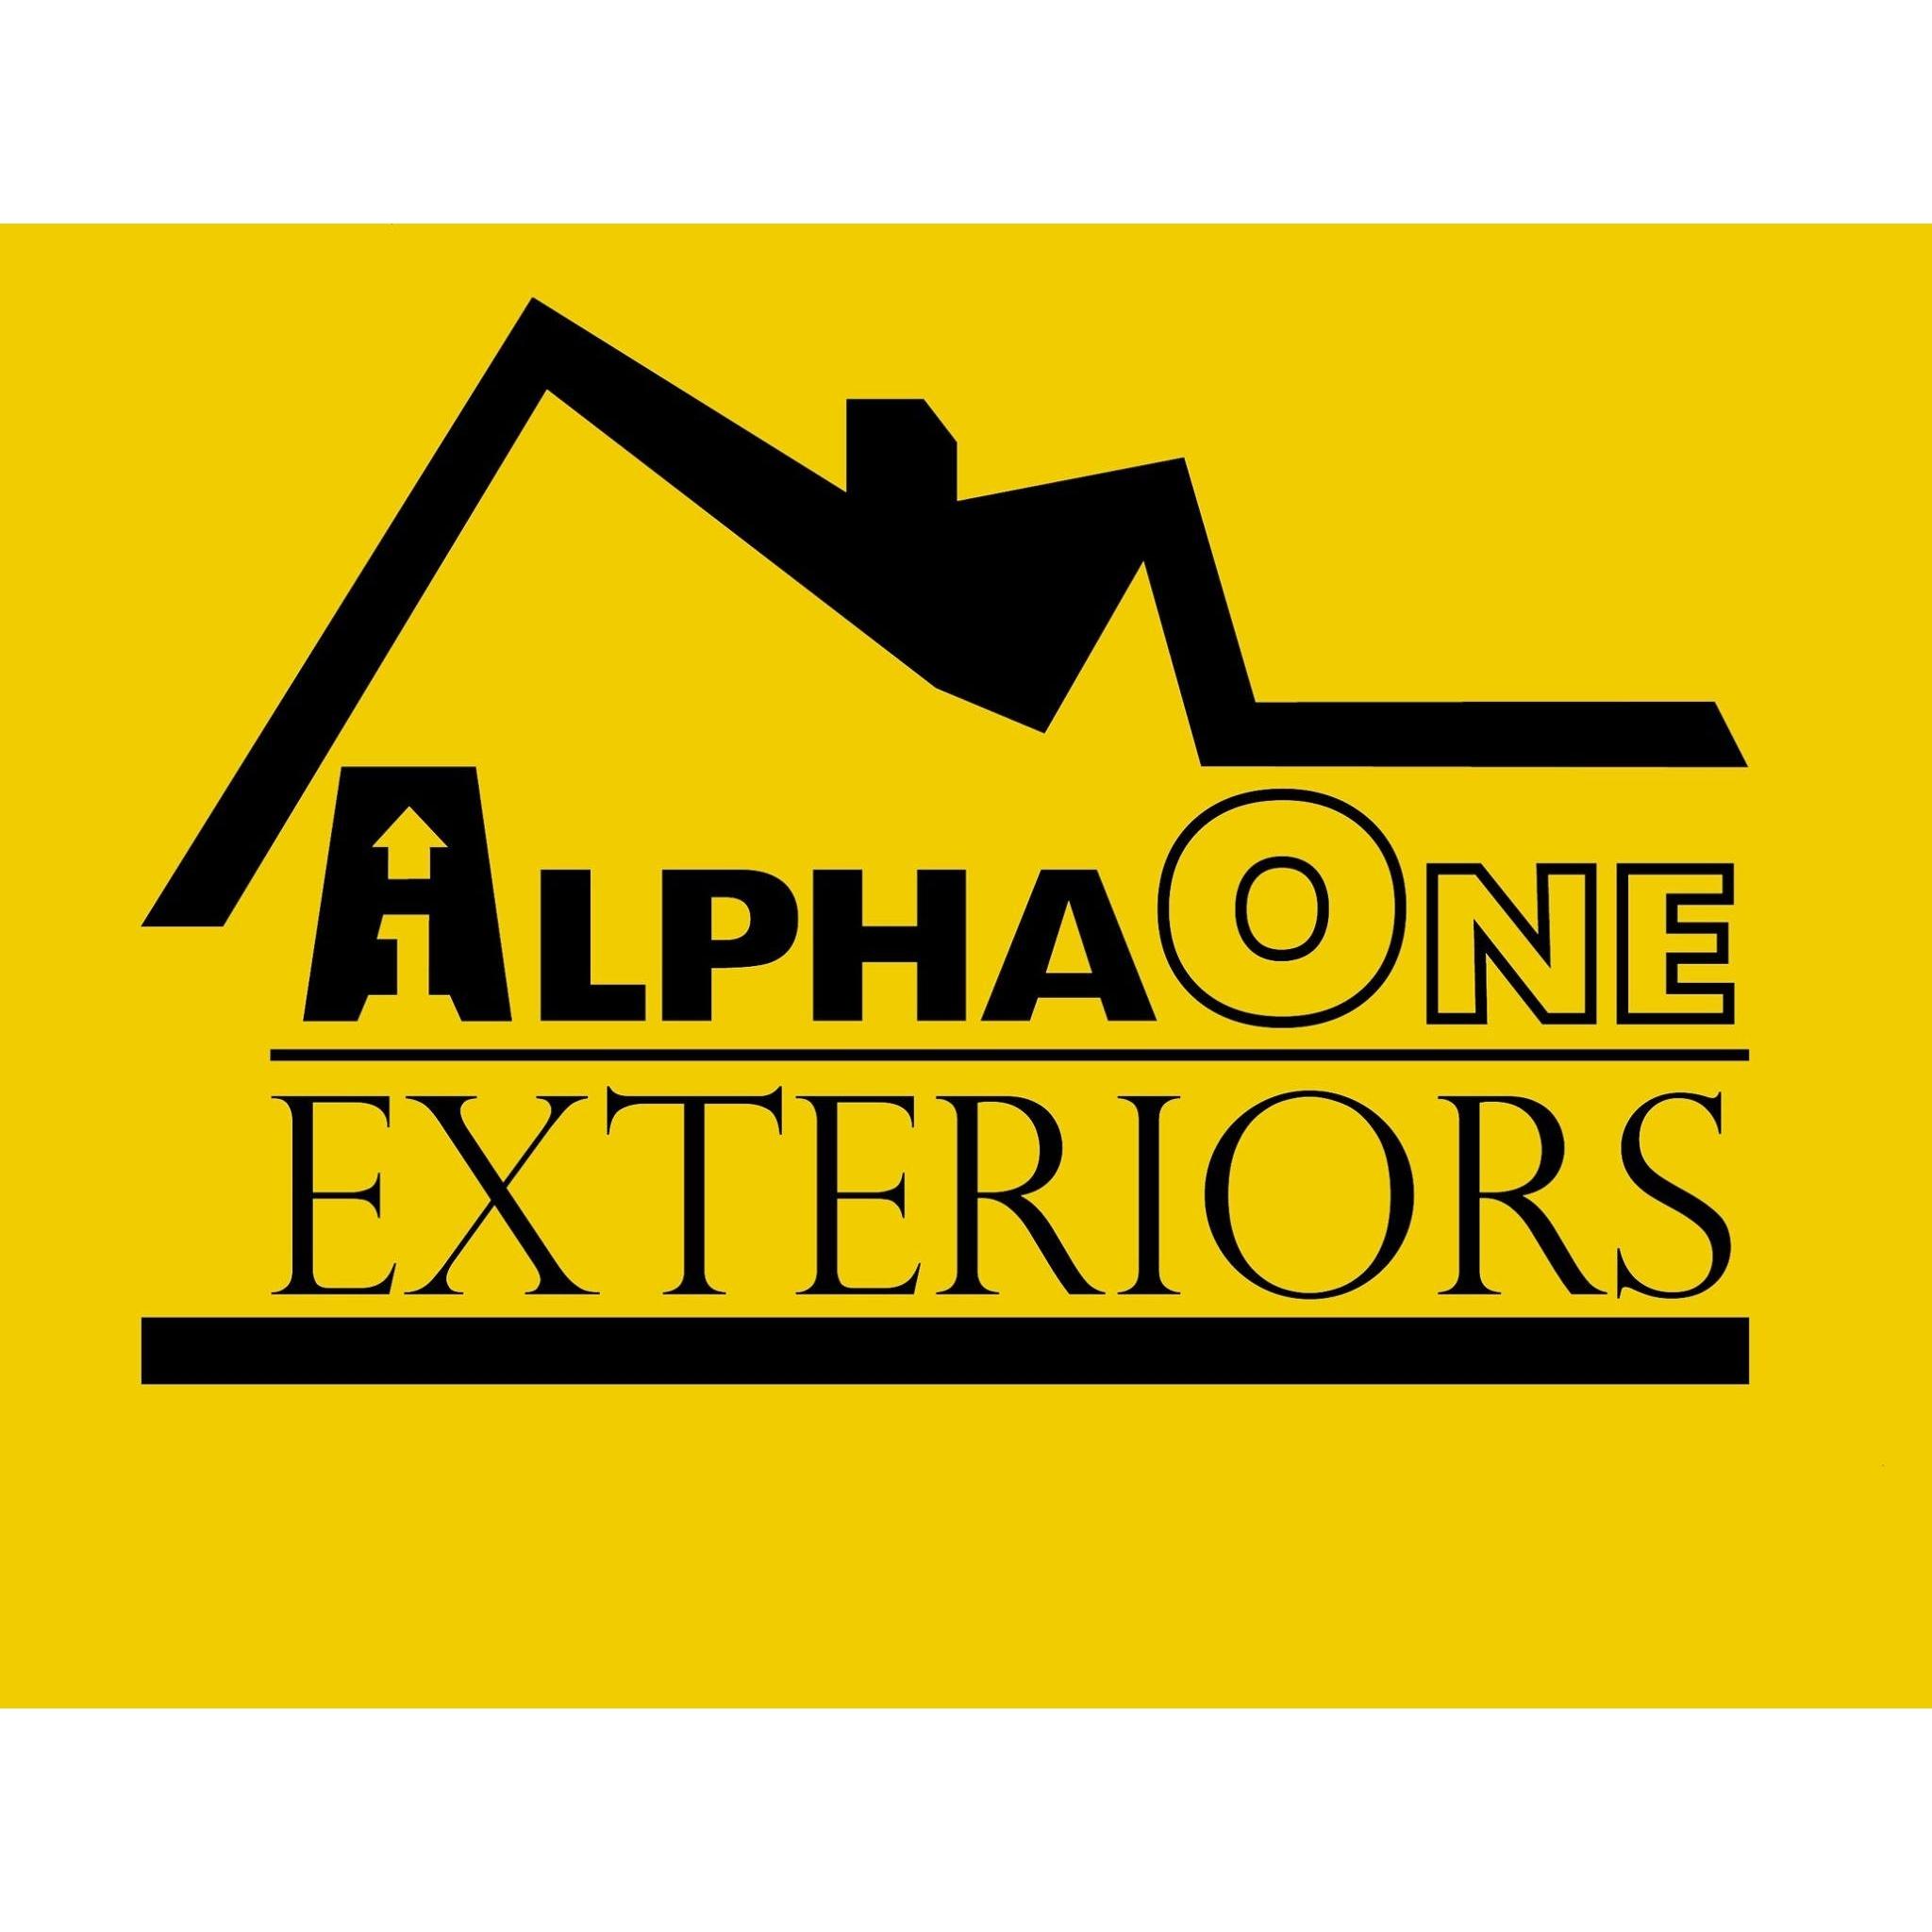 AlphaOne Exteriors